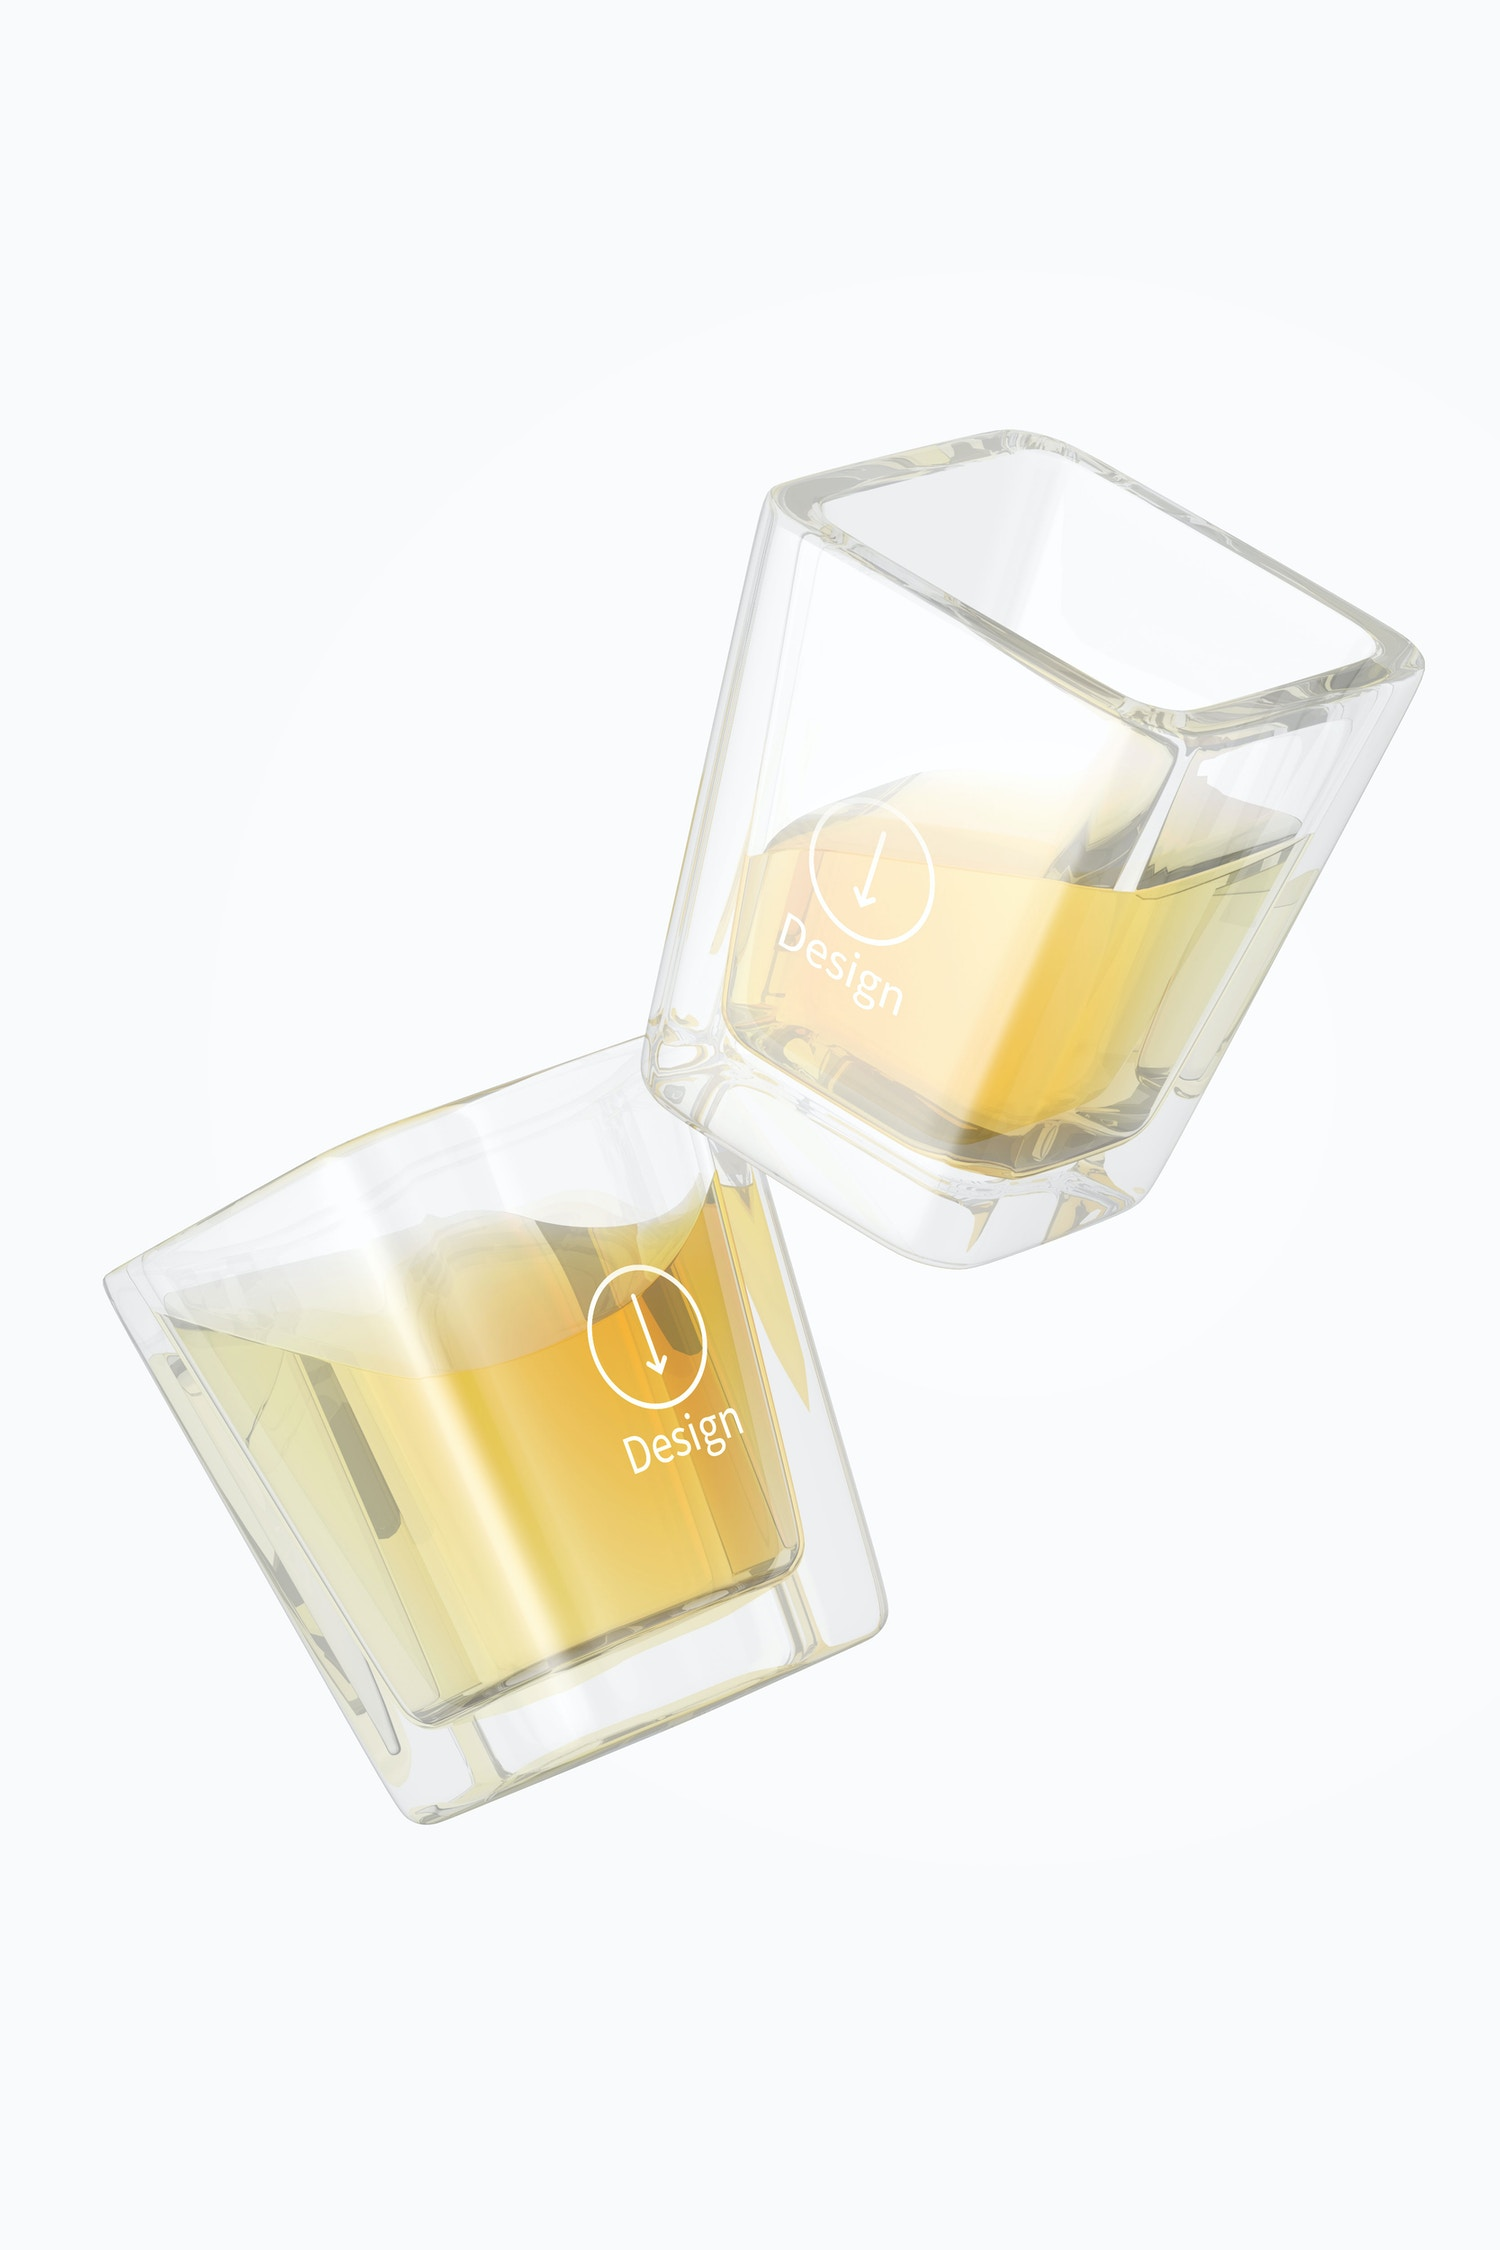 Square Shot Glasses Mockup, Floating